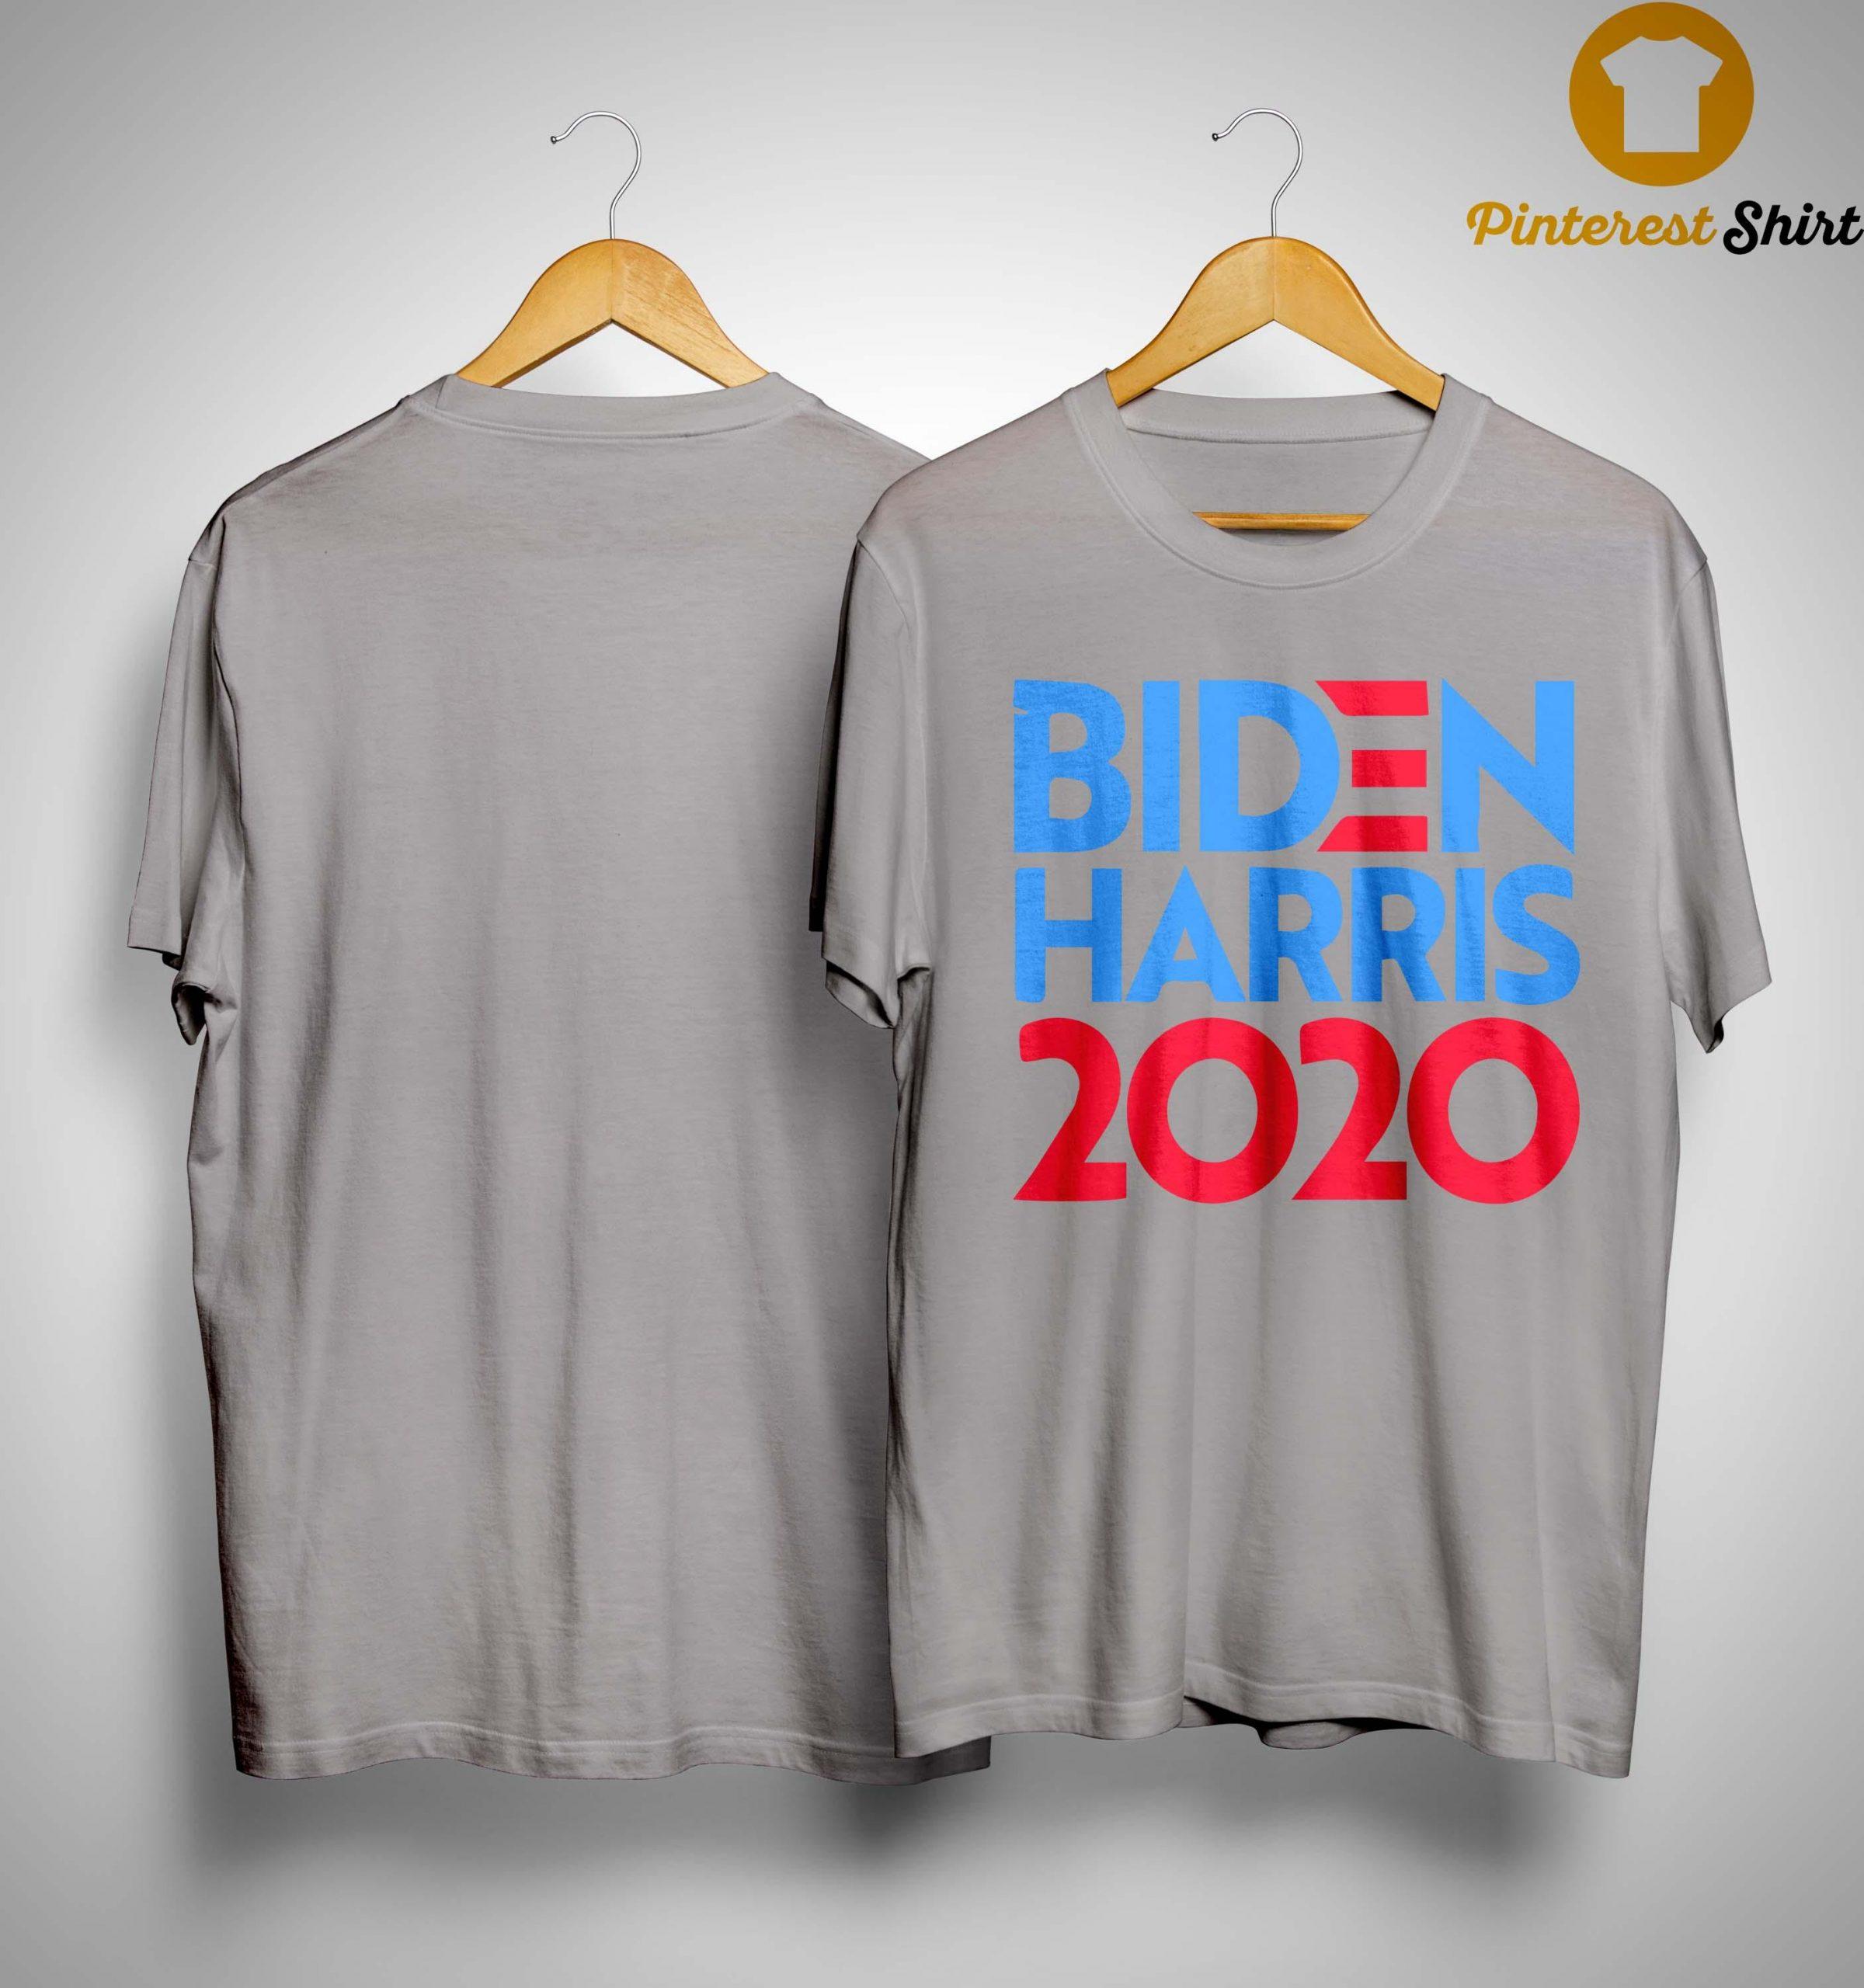 President Xi Biden Harris 2020 Shirt